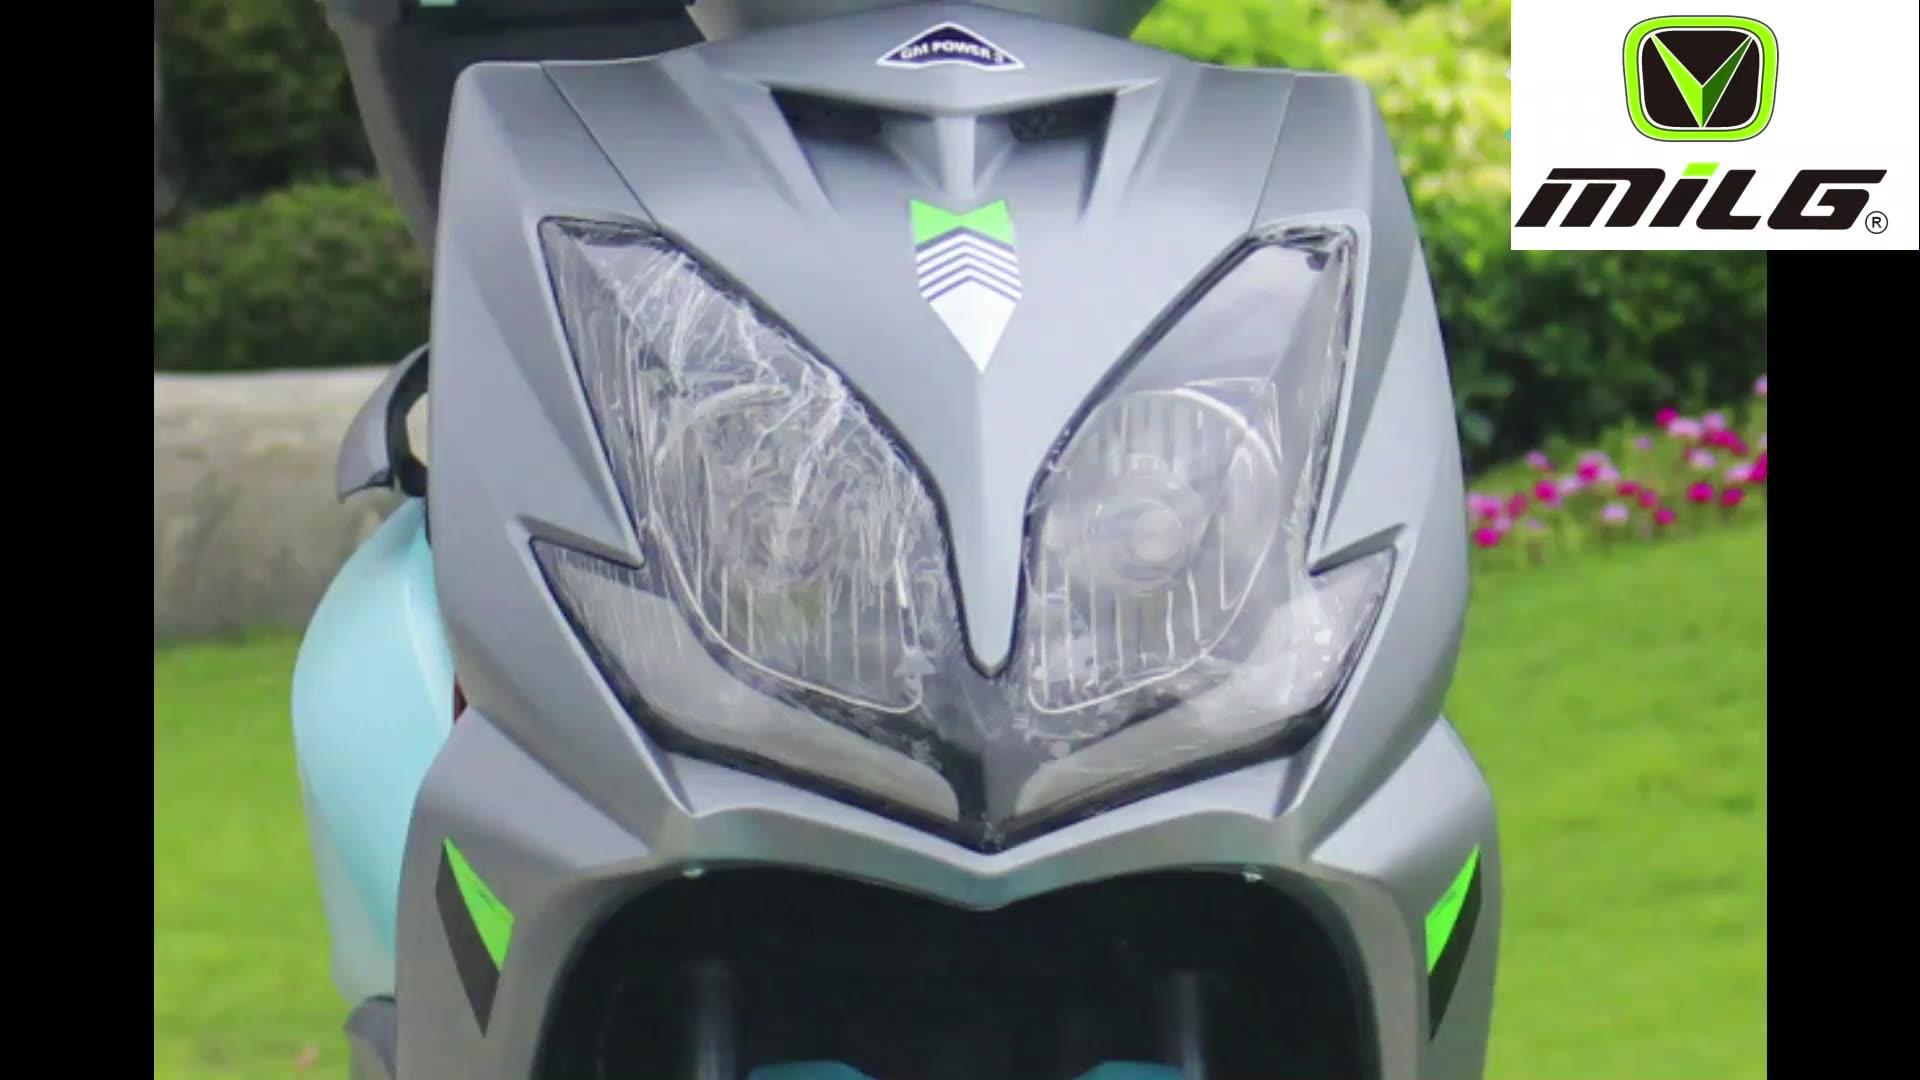 सस्ते उच्च शक्ति उच्च गति इलेक्ट्रिक स्कूटर 72V60V 20AH बिजली की मोटर साइकिल पैडल बिक्री के लिए डिस्क ब्रेक बिजली साइकिल सीकेडी